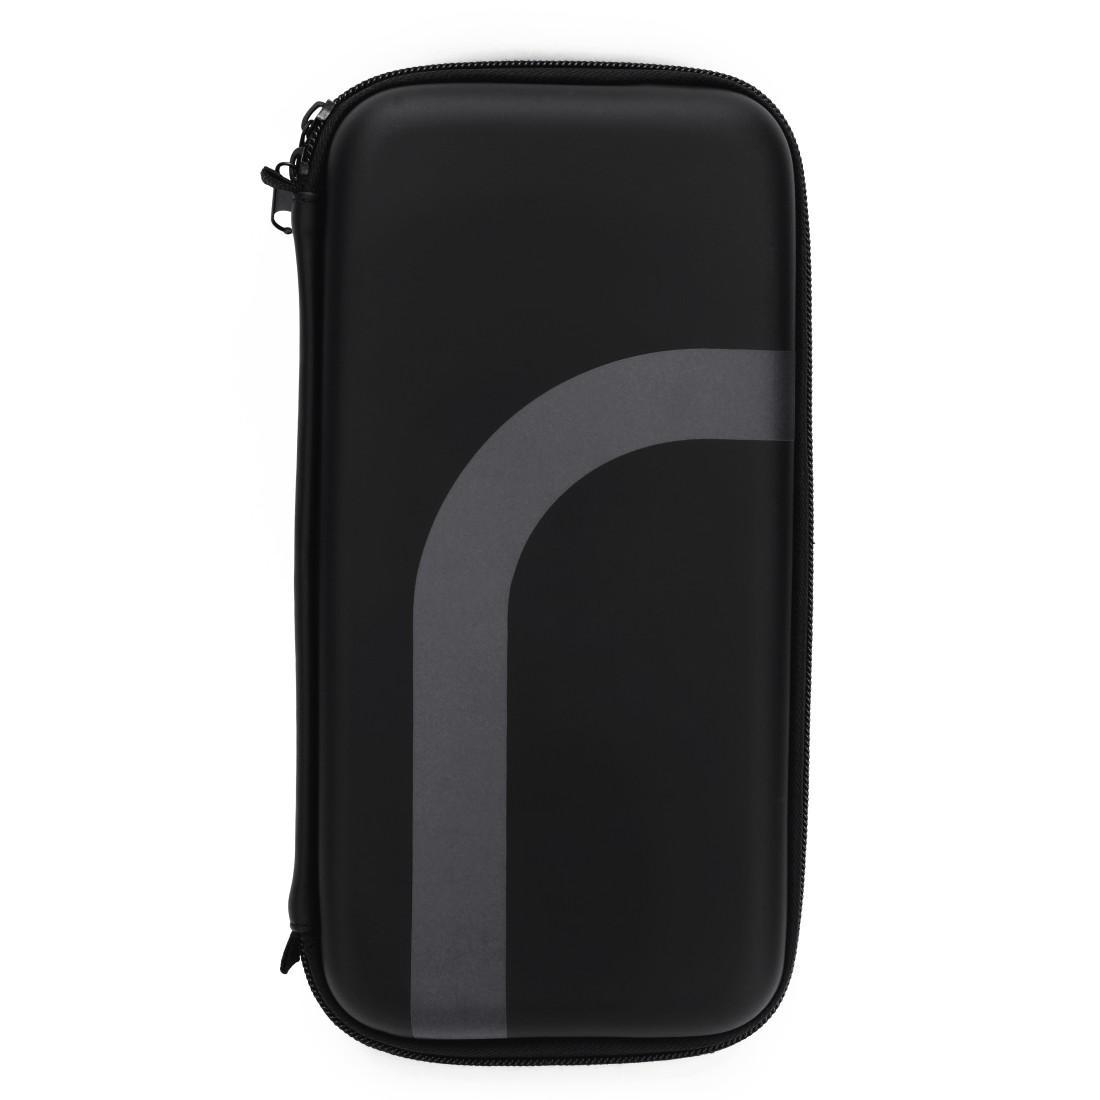 Калъф за гейм-конзола Nintendo Switch HAMA 54696, Черен